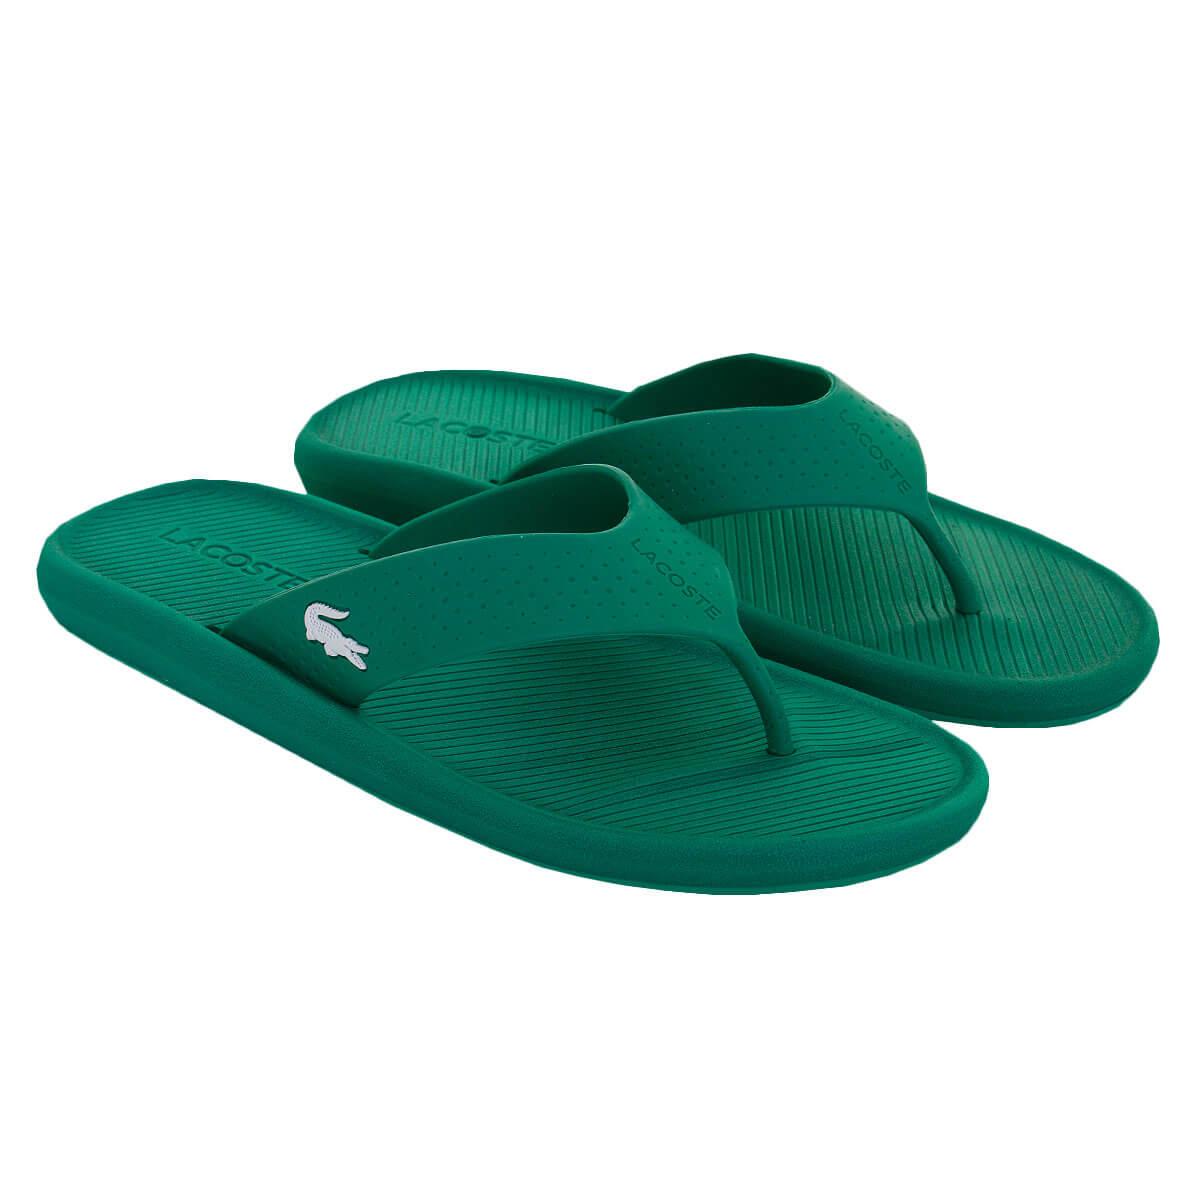 Sandal Cma Croco Men's Flip 1 Lacoste 219 FlopsEbay CQrsdthx